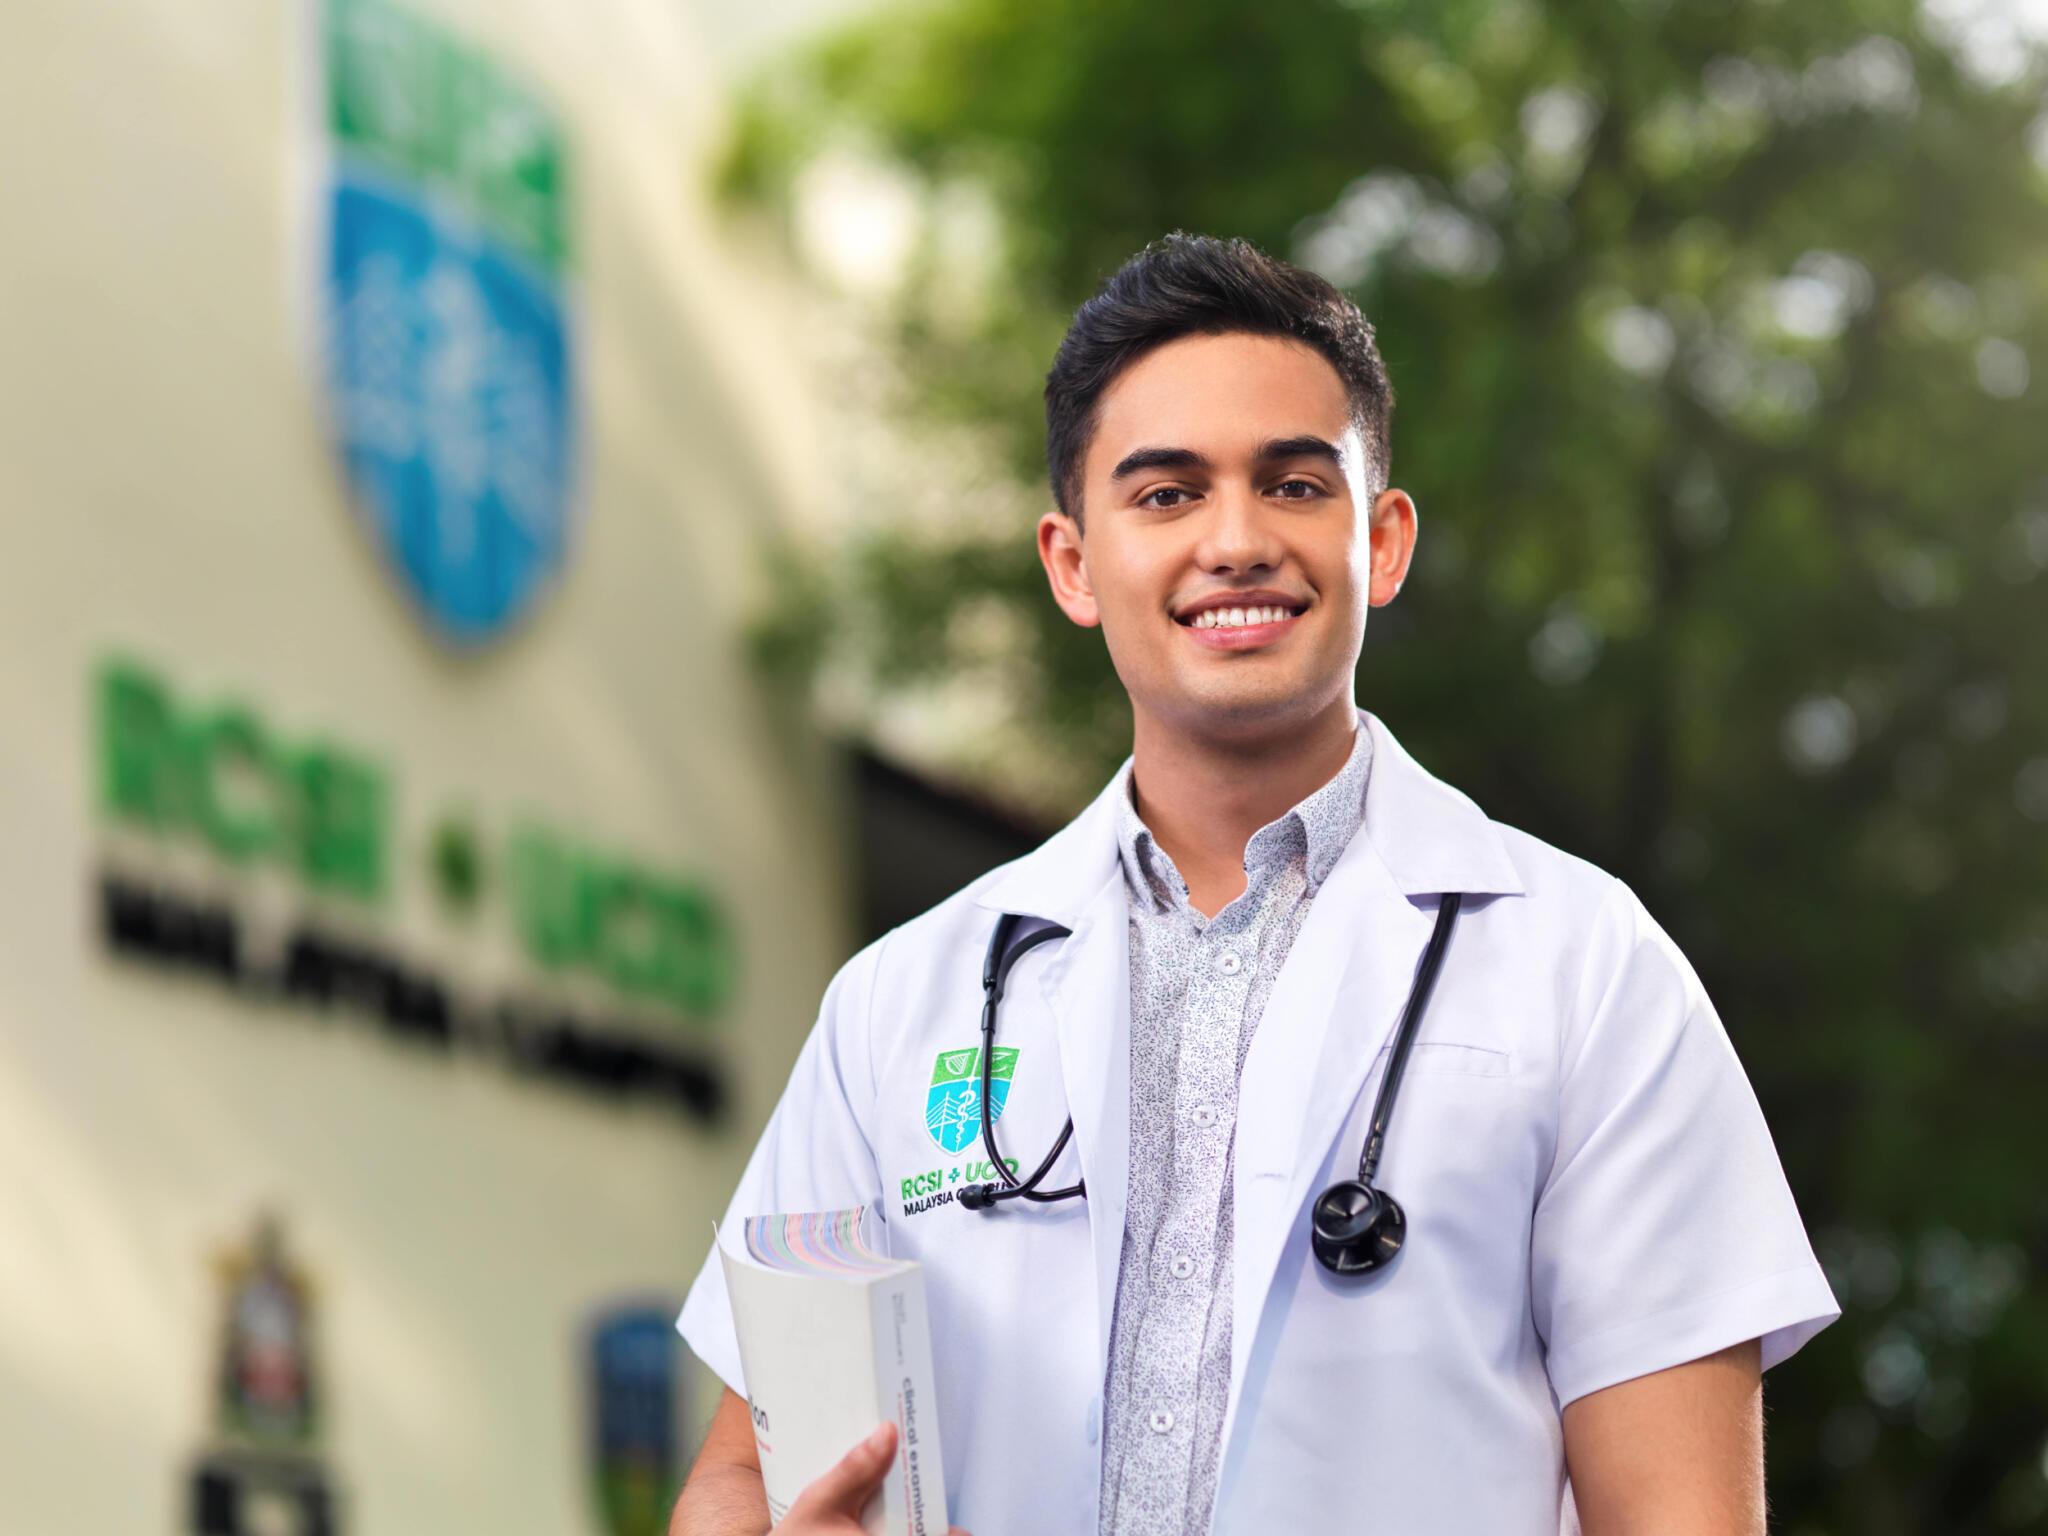 Why Should I Study Medicine at RUMC? blog image